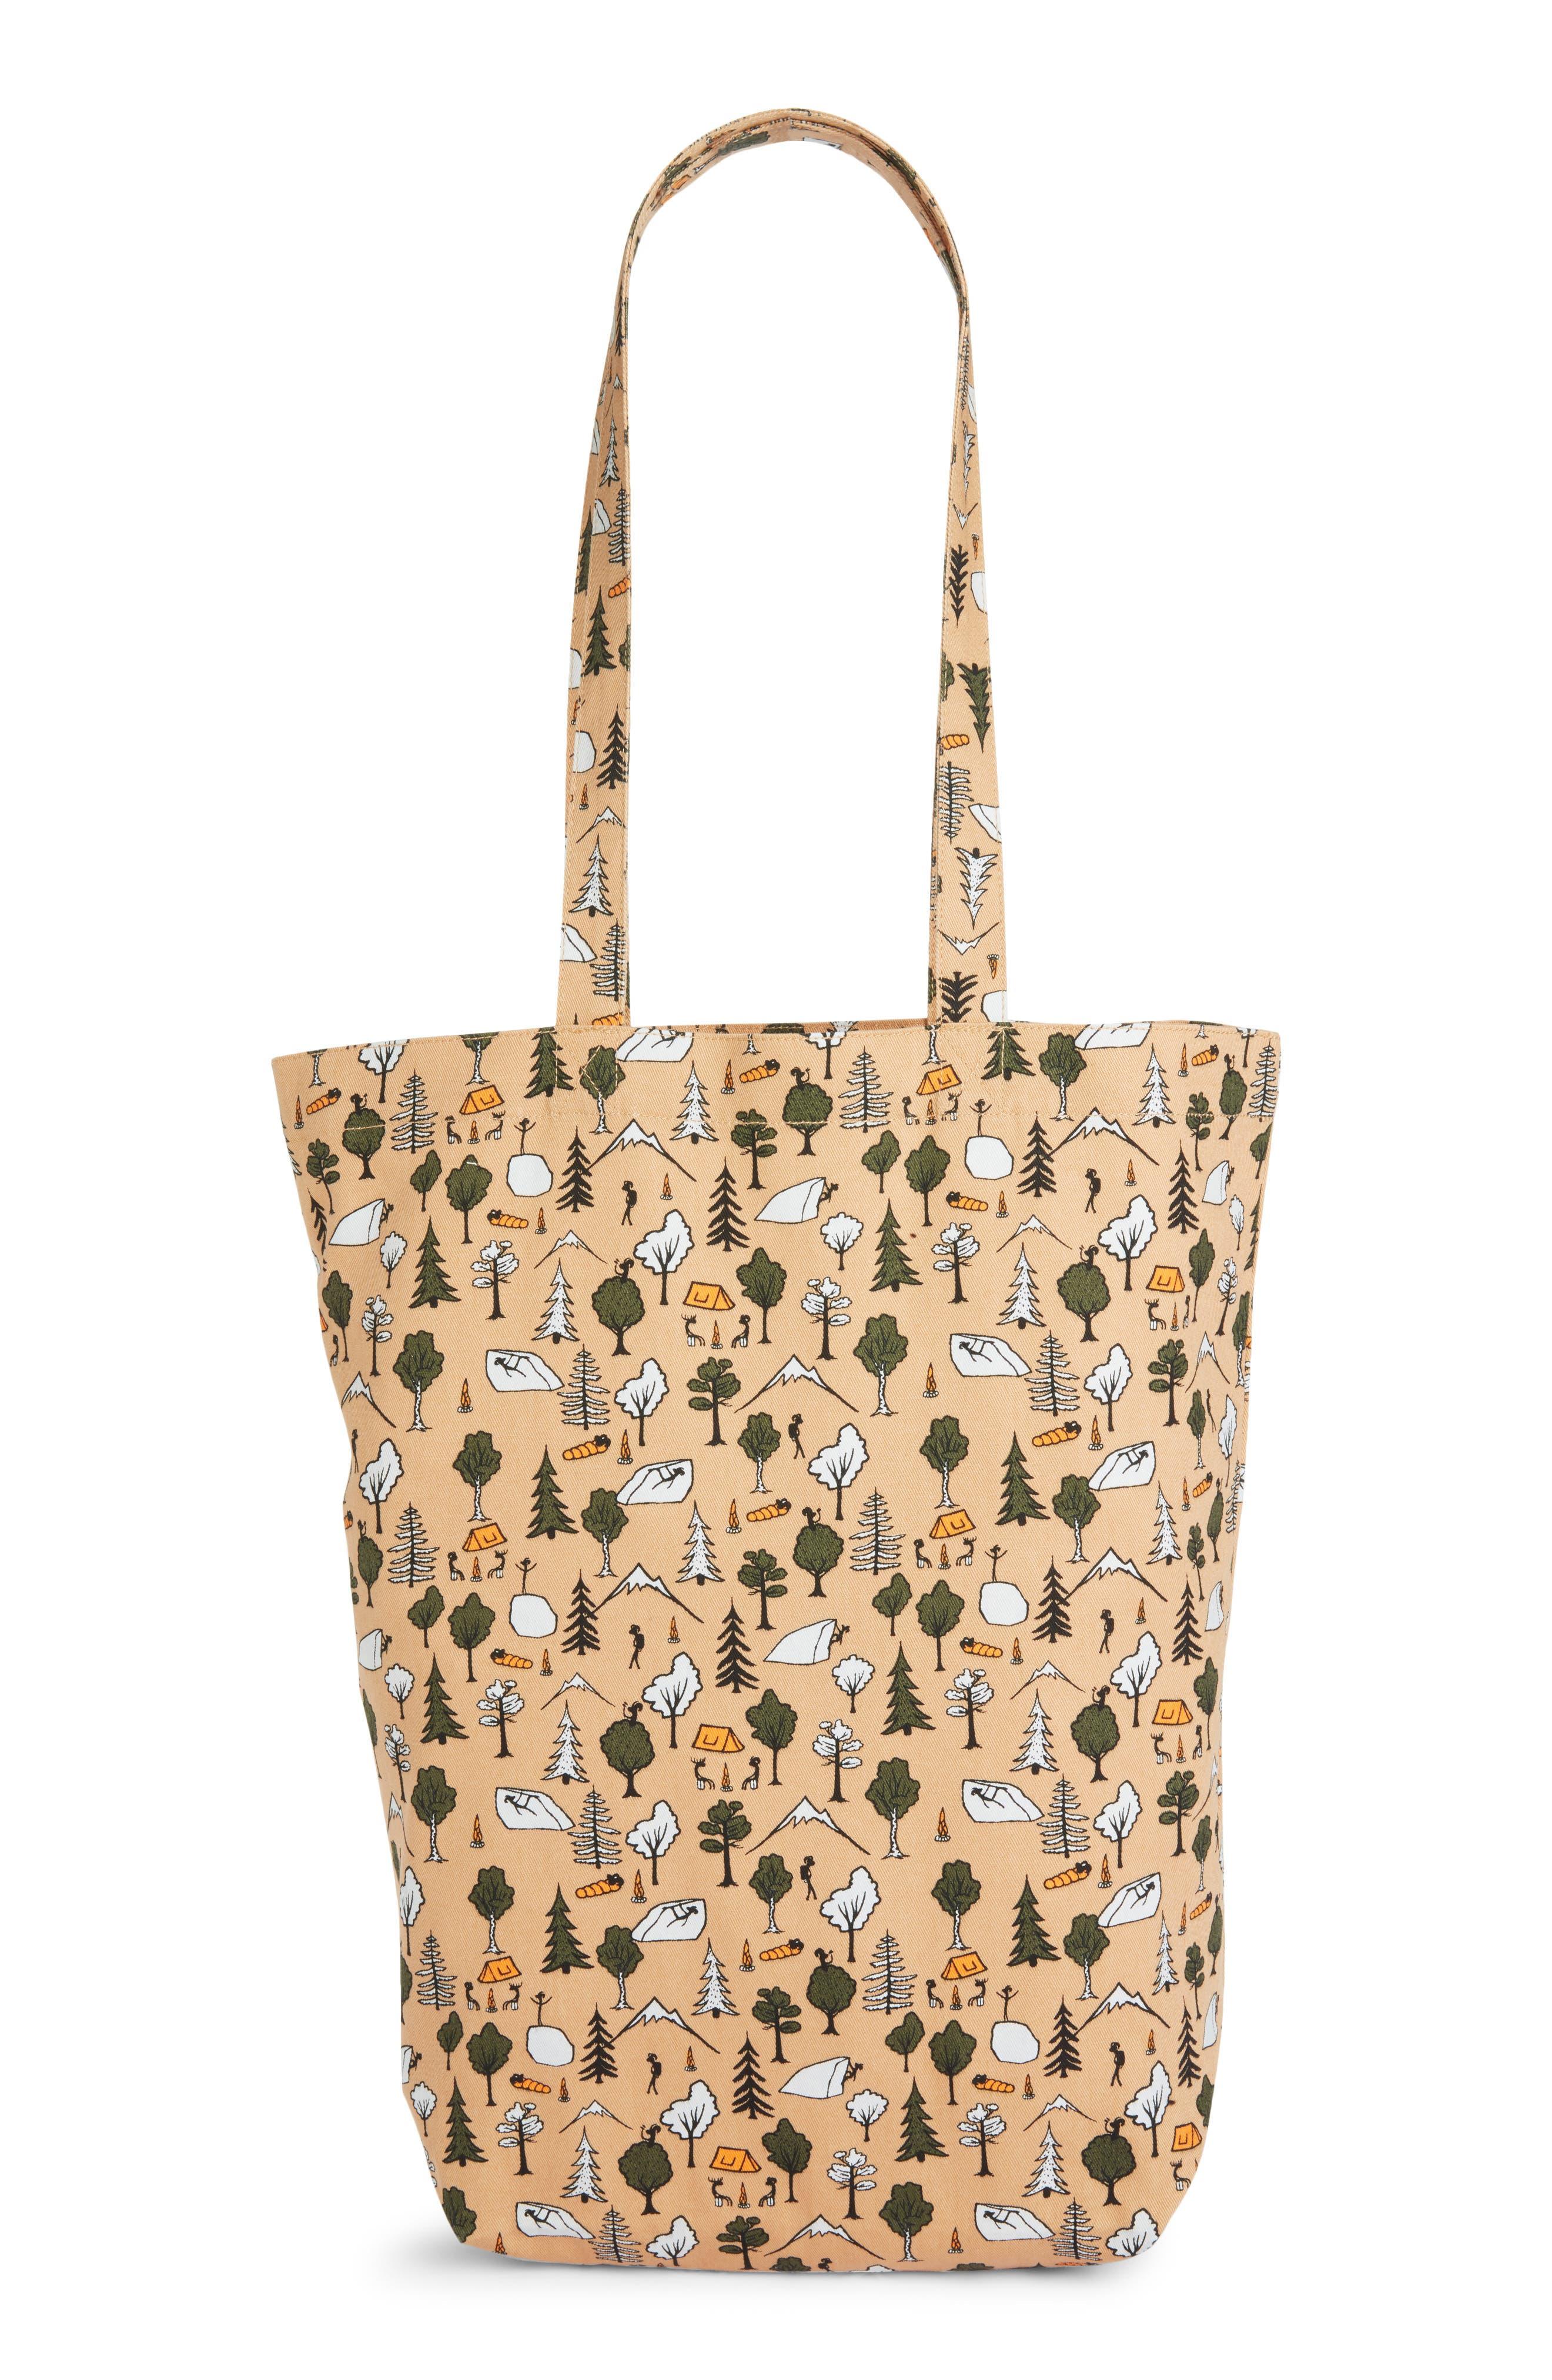 Jonas Claesson Wood Tote Bag